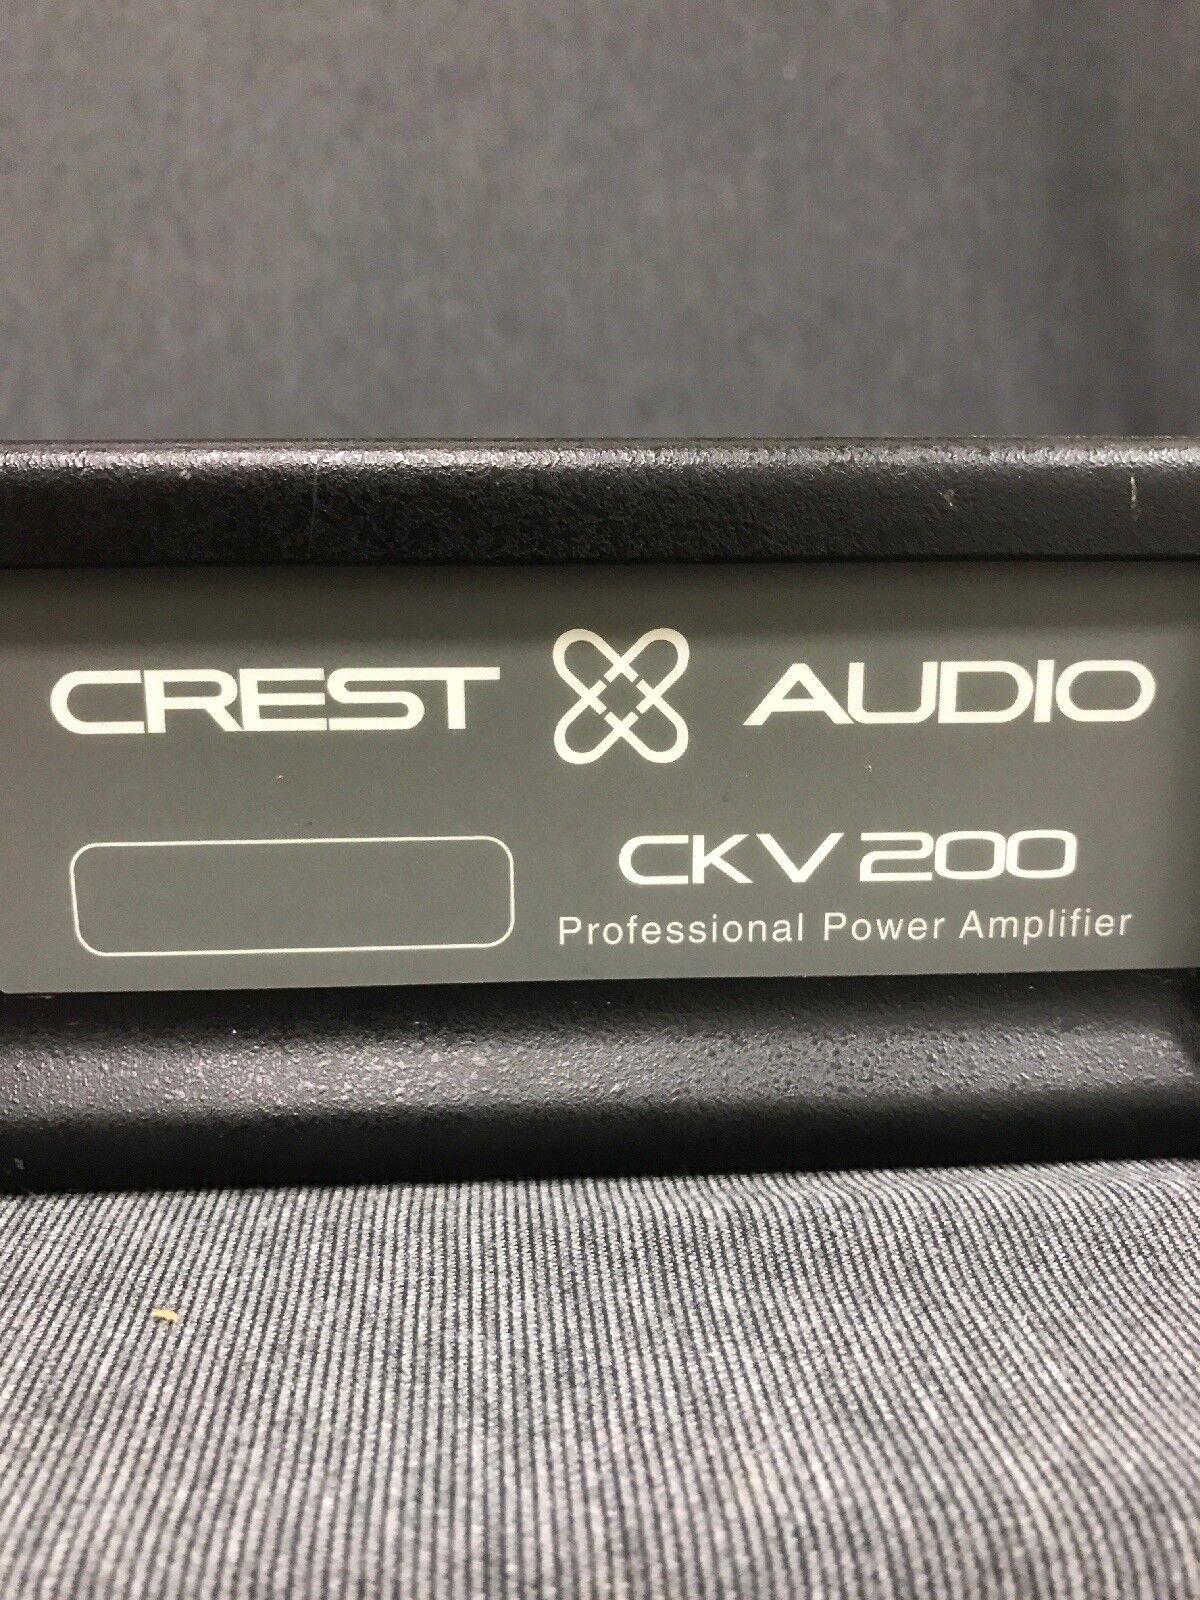 CREST Audio CKV200 Professional Audio Power Amp Working Great